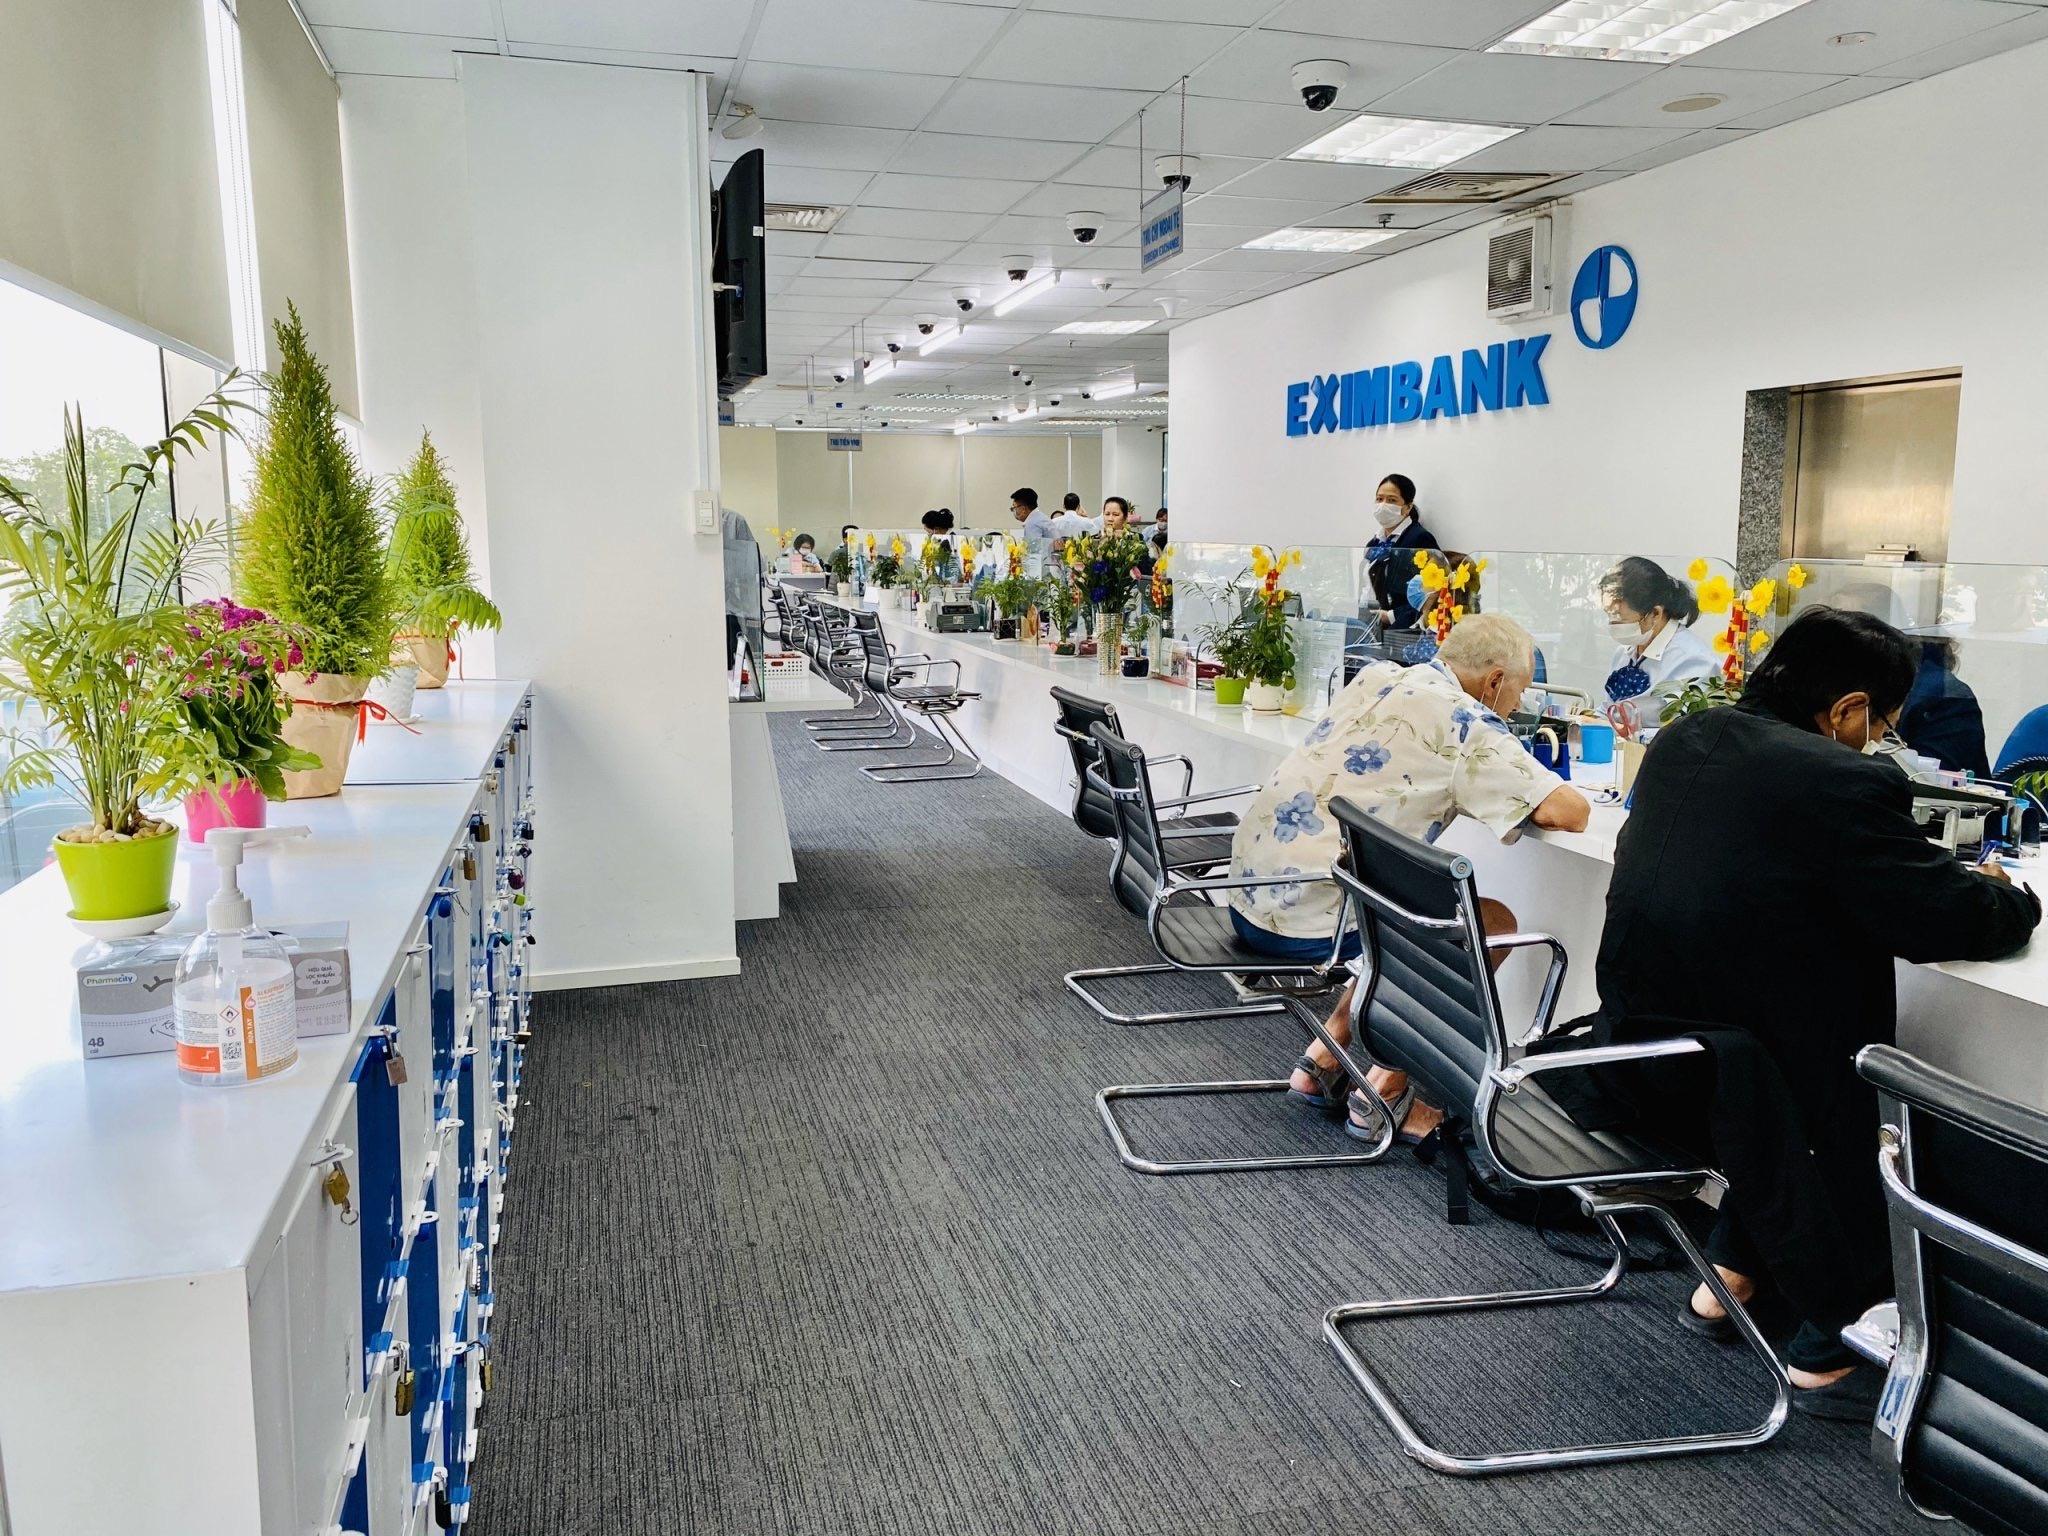 eximbank cong bo dieu chinh lai suat chung tay cung khach hang vuot kho